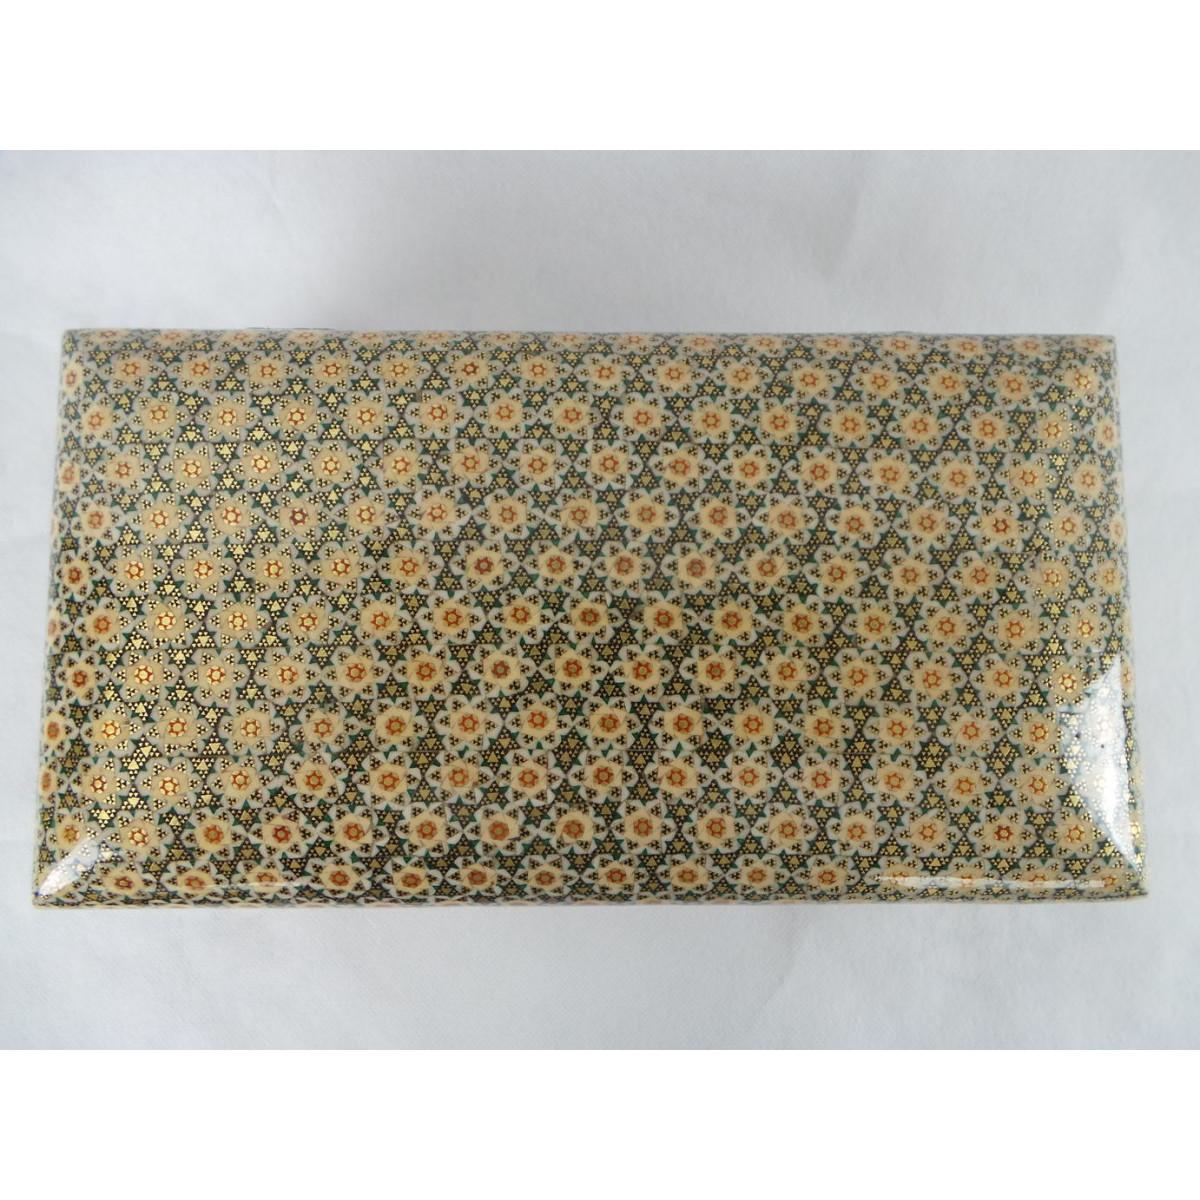 Persian Khatam Handicrafts Cutlery Box - HKH3000-Persian Handicrafts